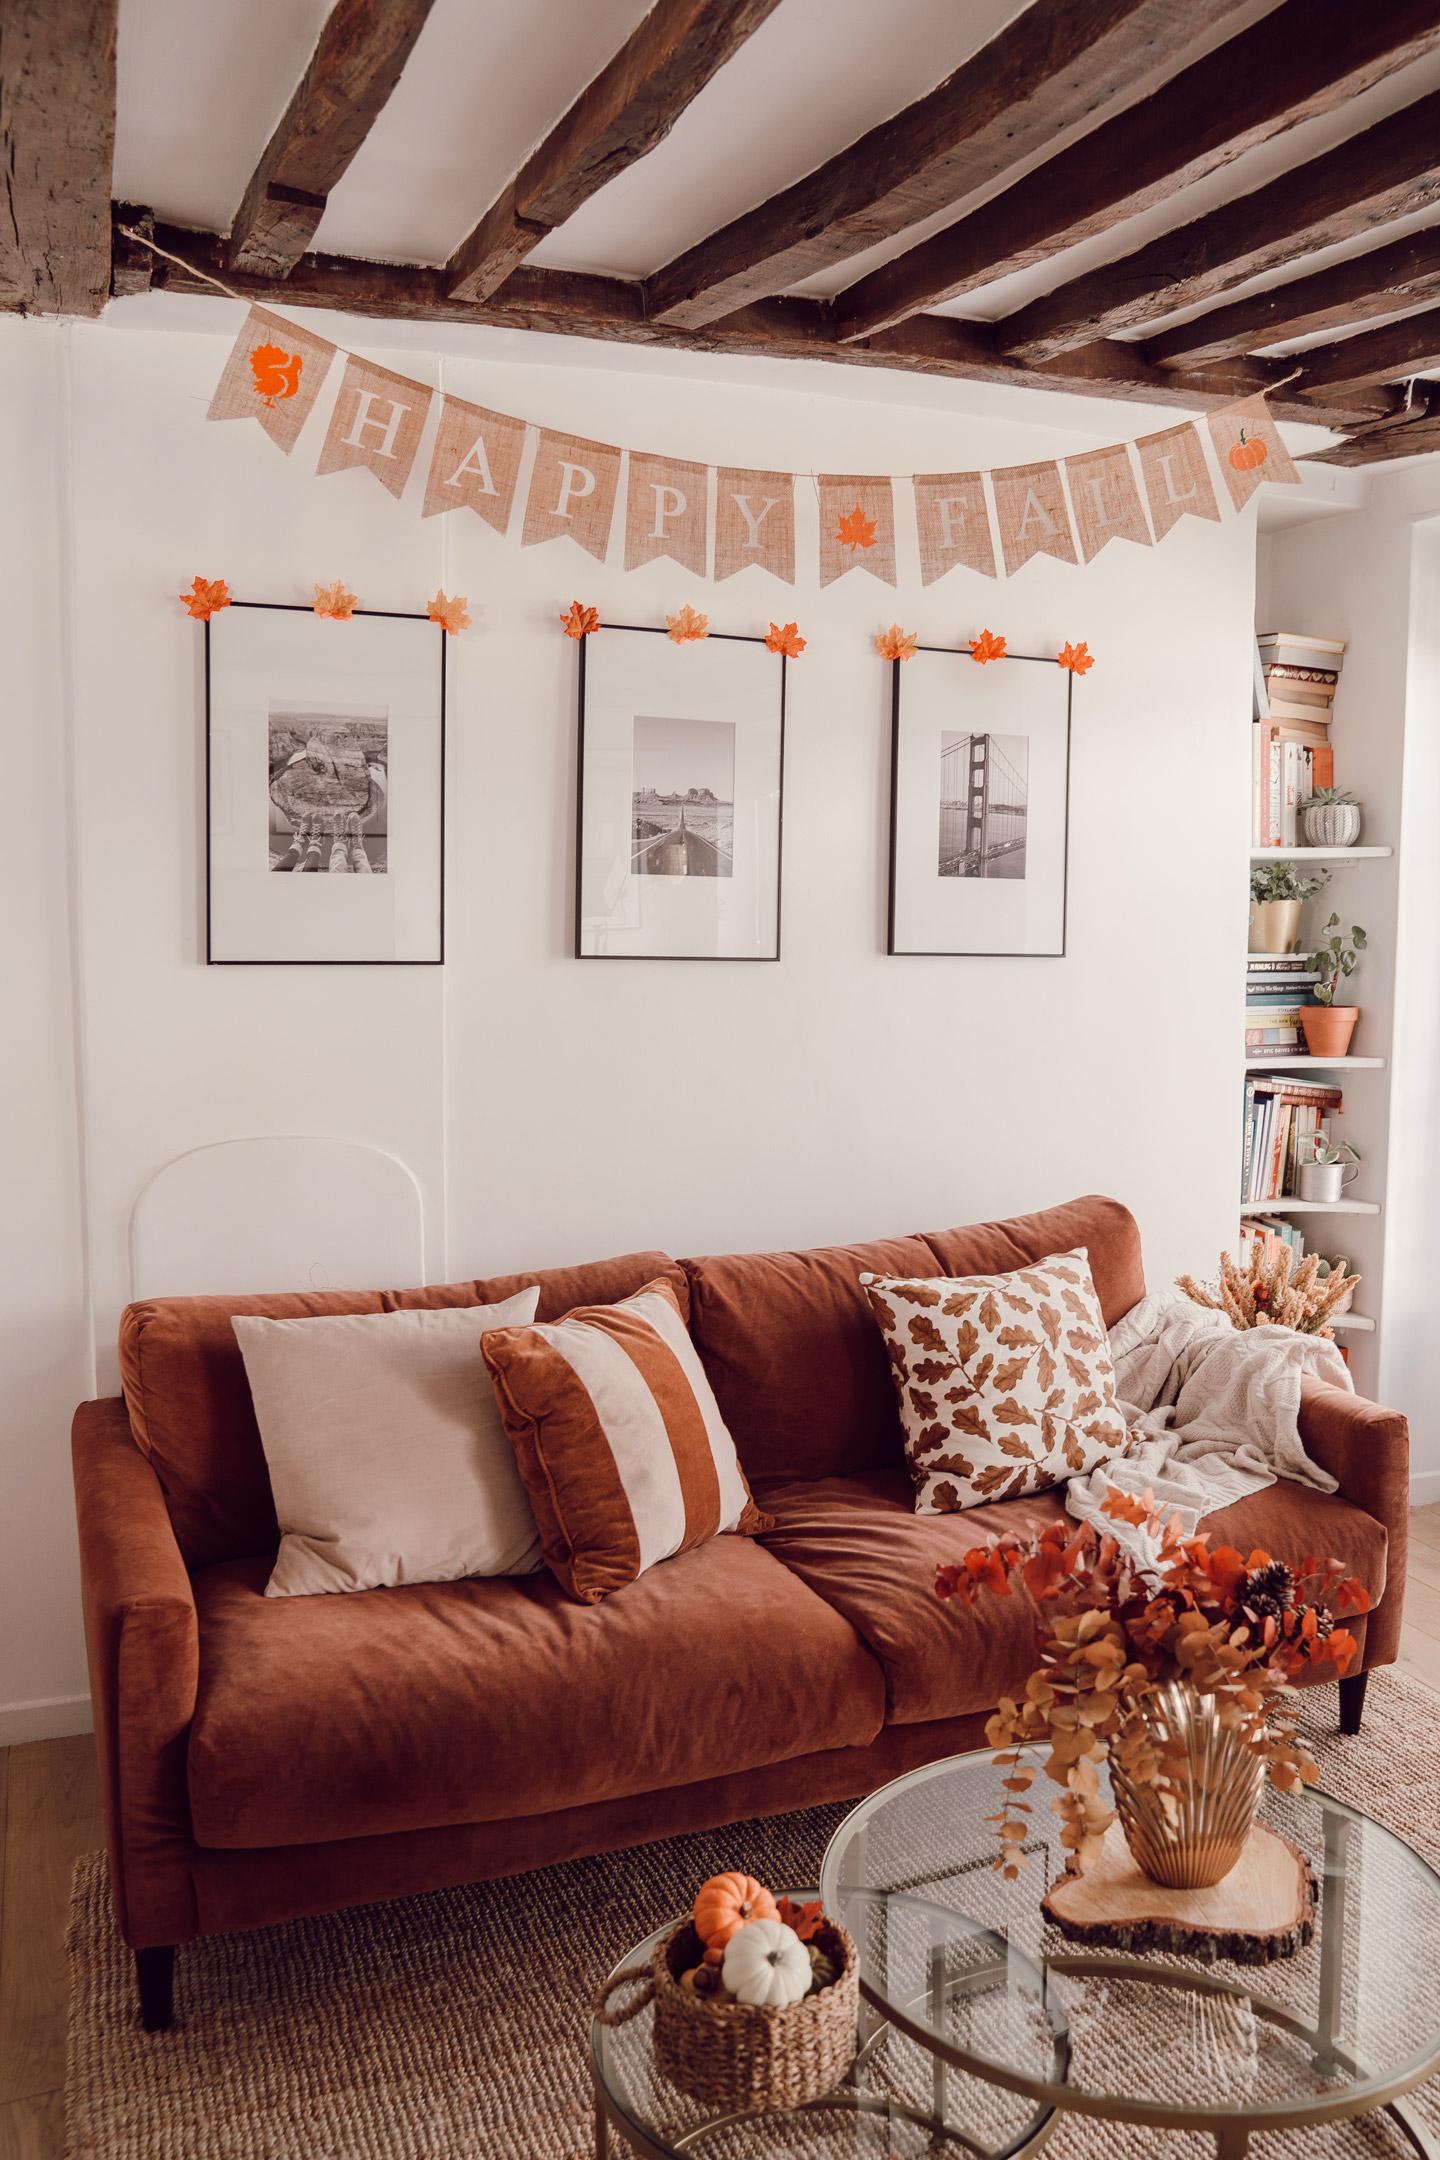 decoration-automne-03675